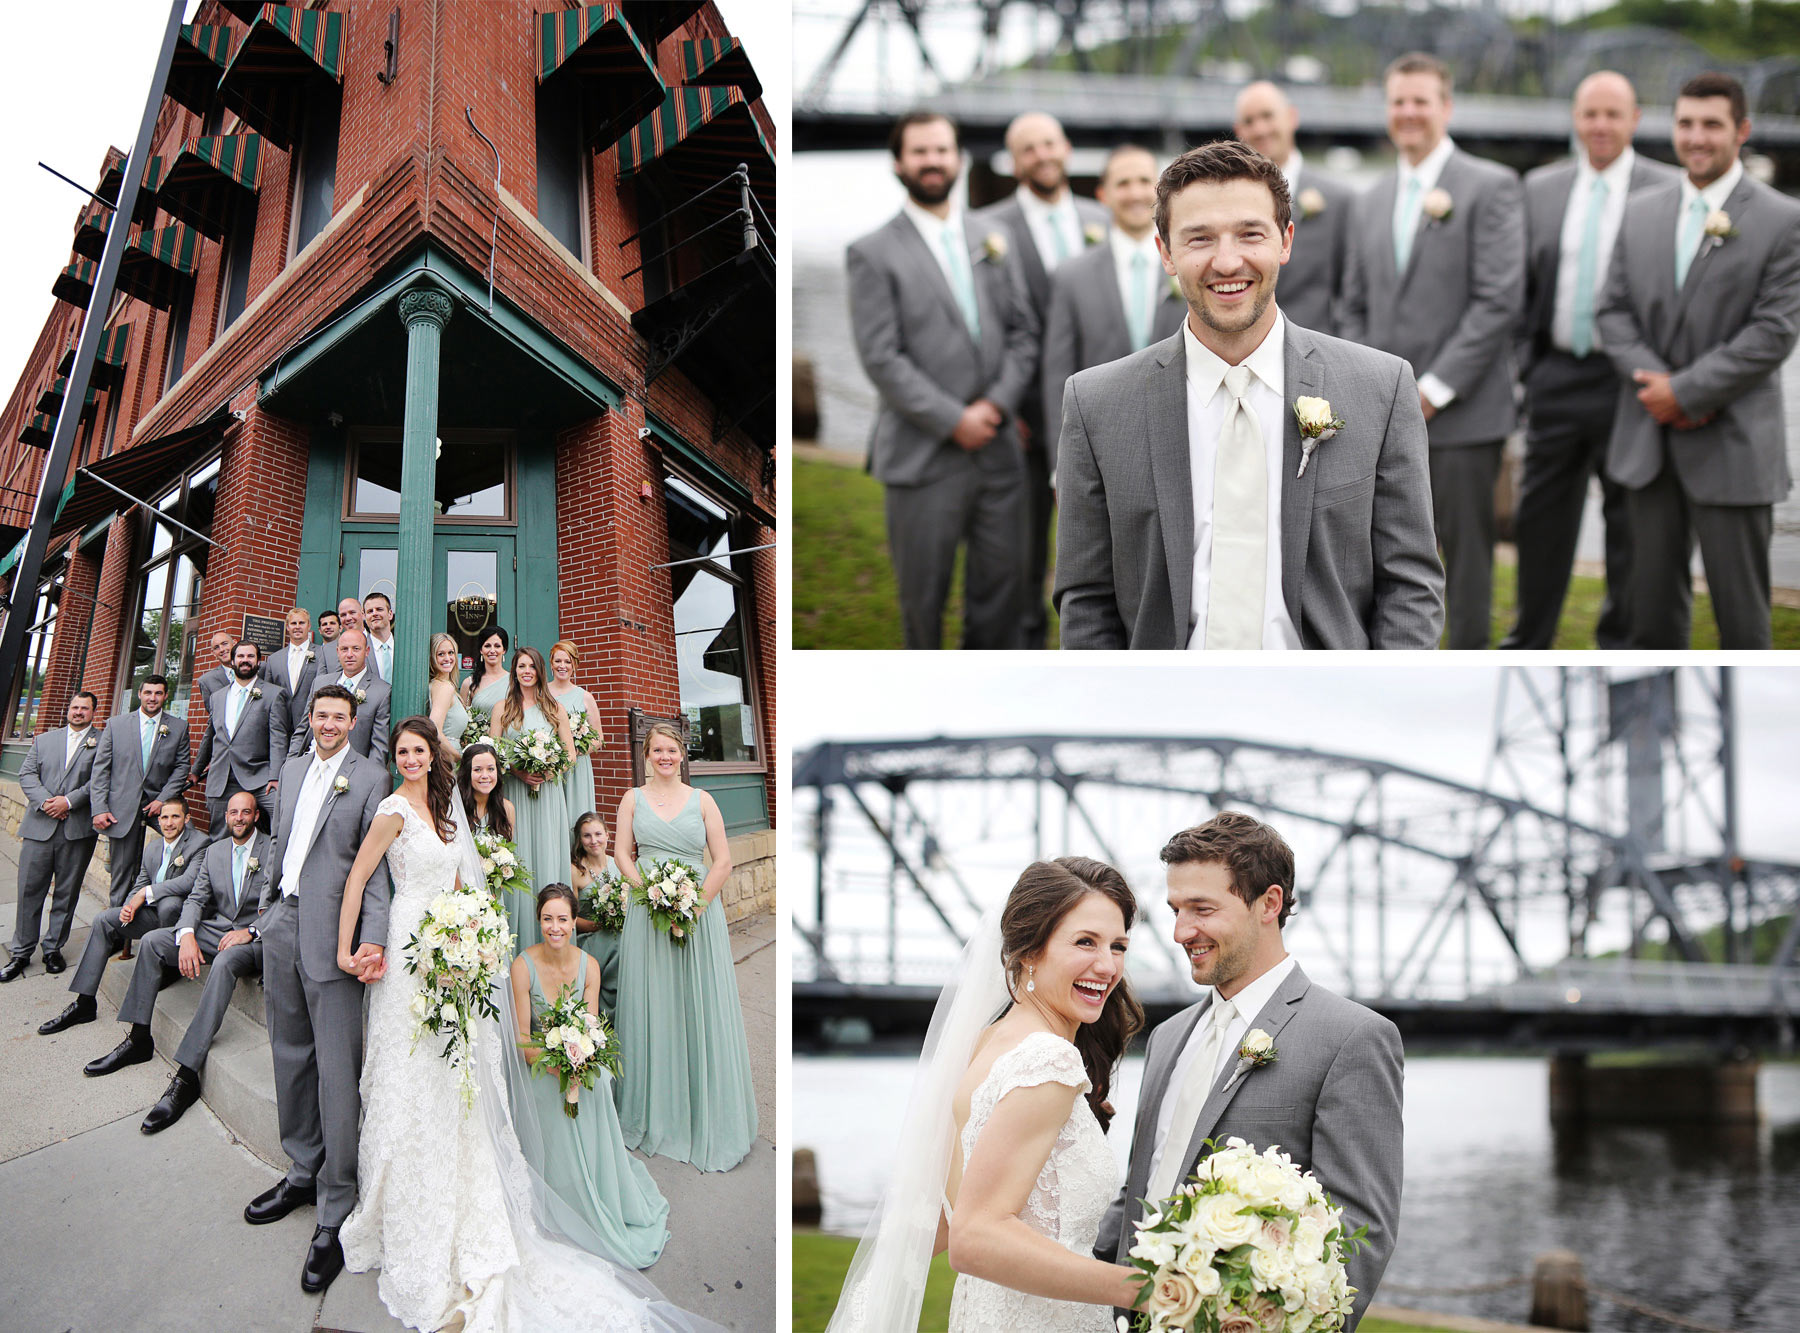 12-Stillwater-Minnesota-Wedding-Photography-by-Vick-Photography--Wedding-Party-Alicia-&-Cole.jpg